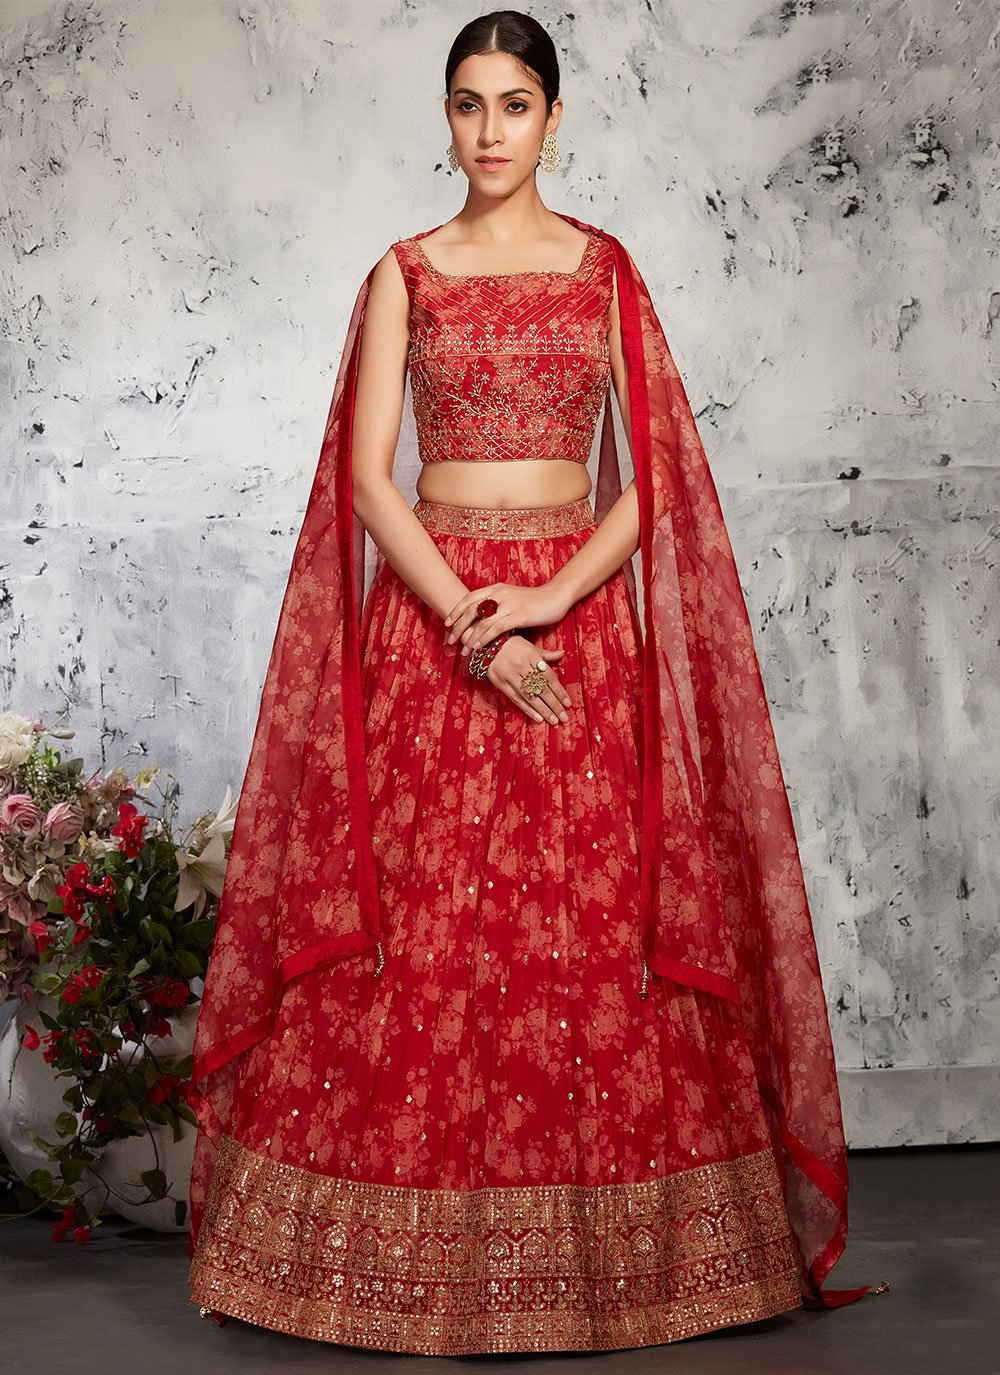 Red Fancy Mehndi Readymade Lehenga Choli